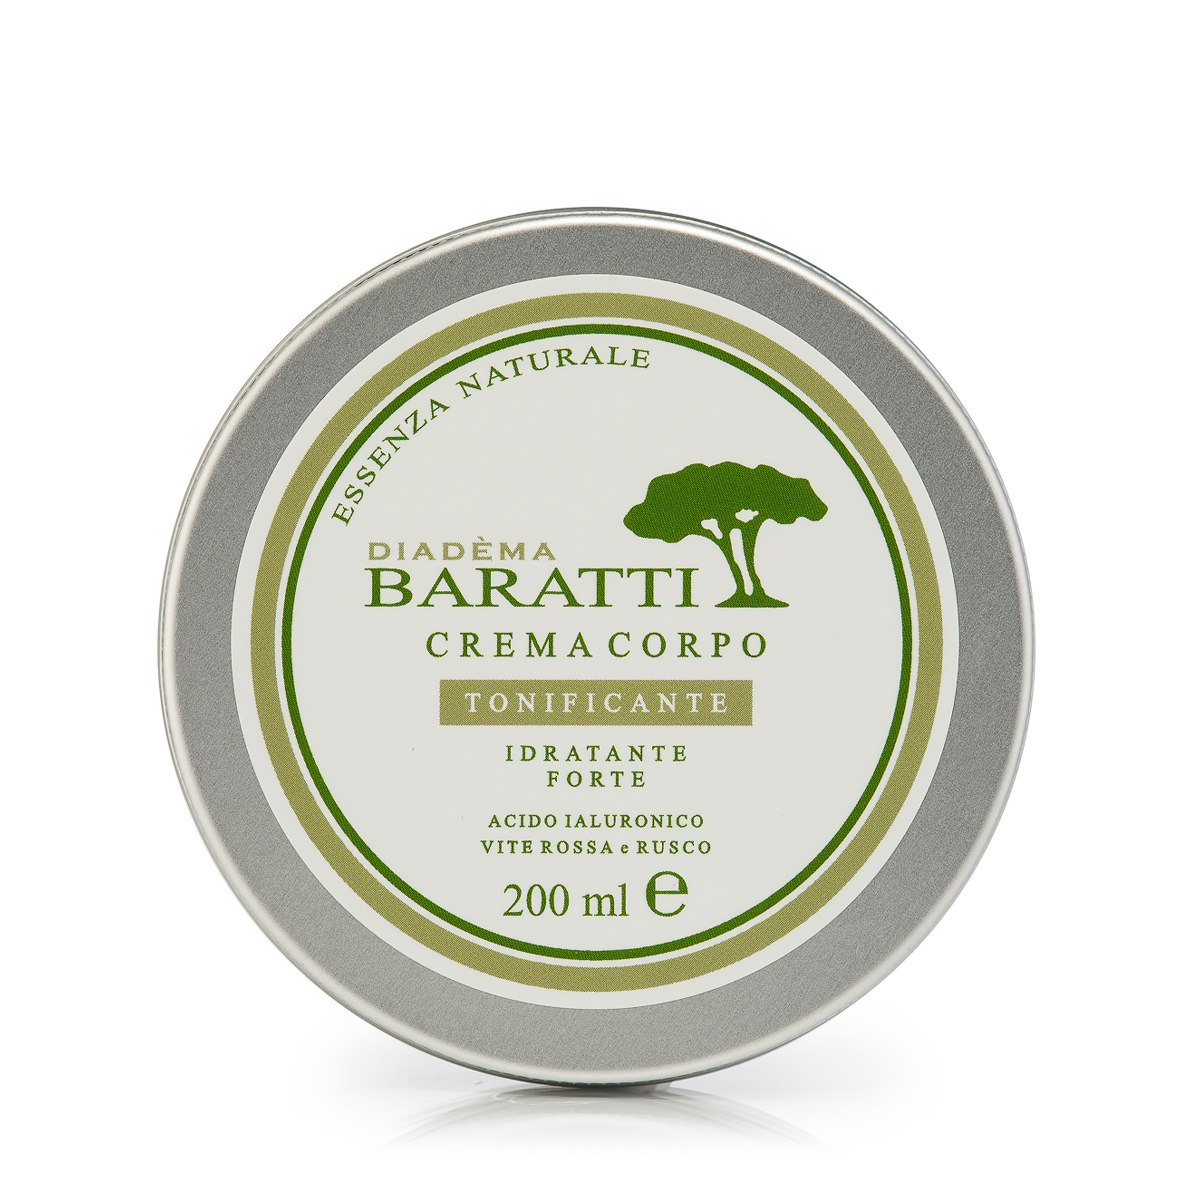 Baratti - Body cream by Diadema 200ml